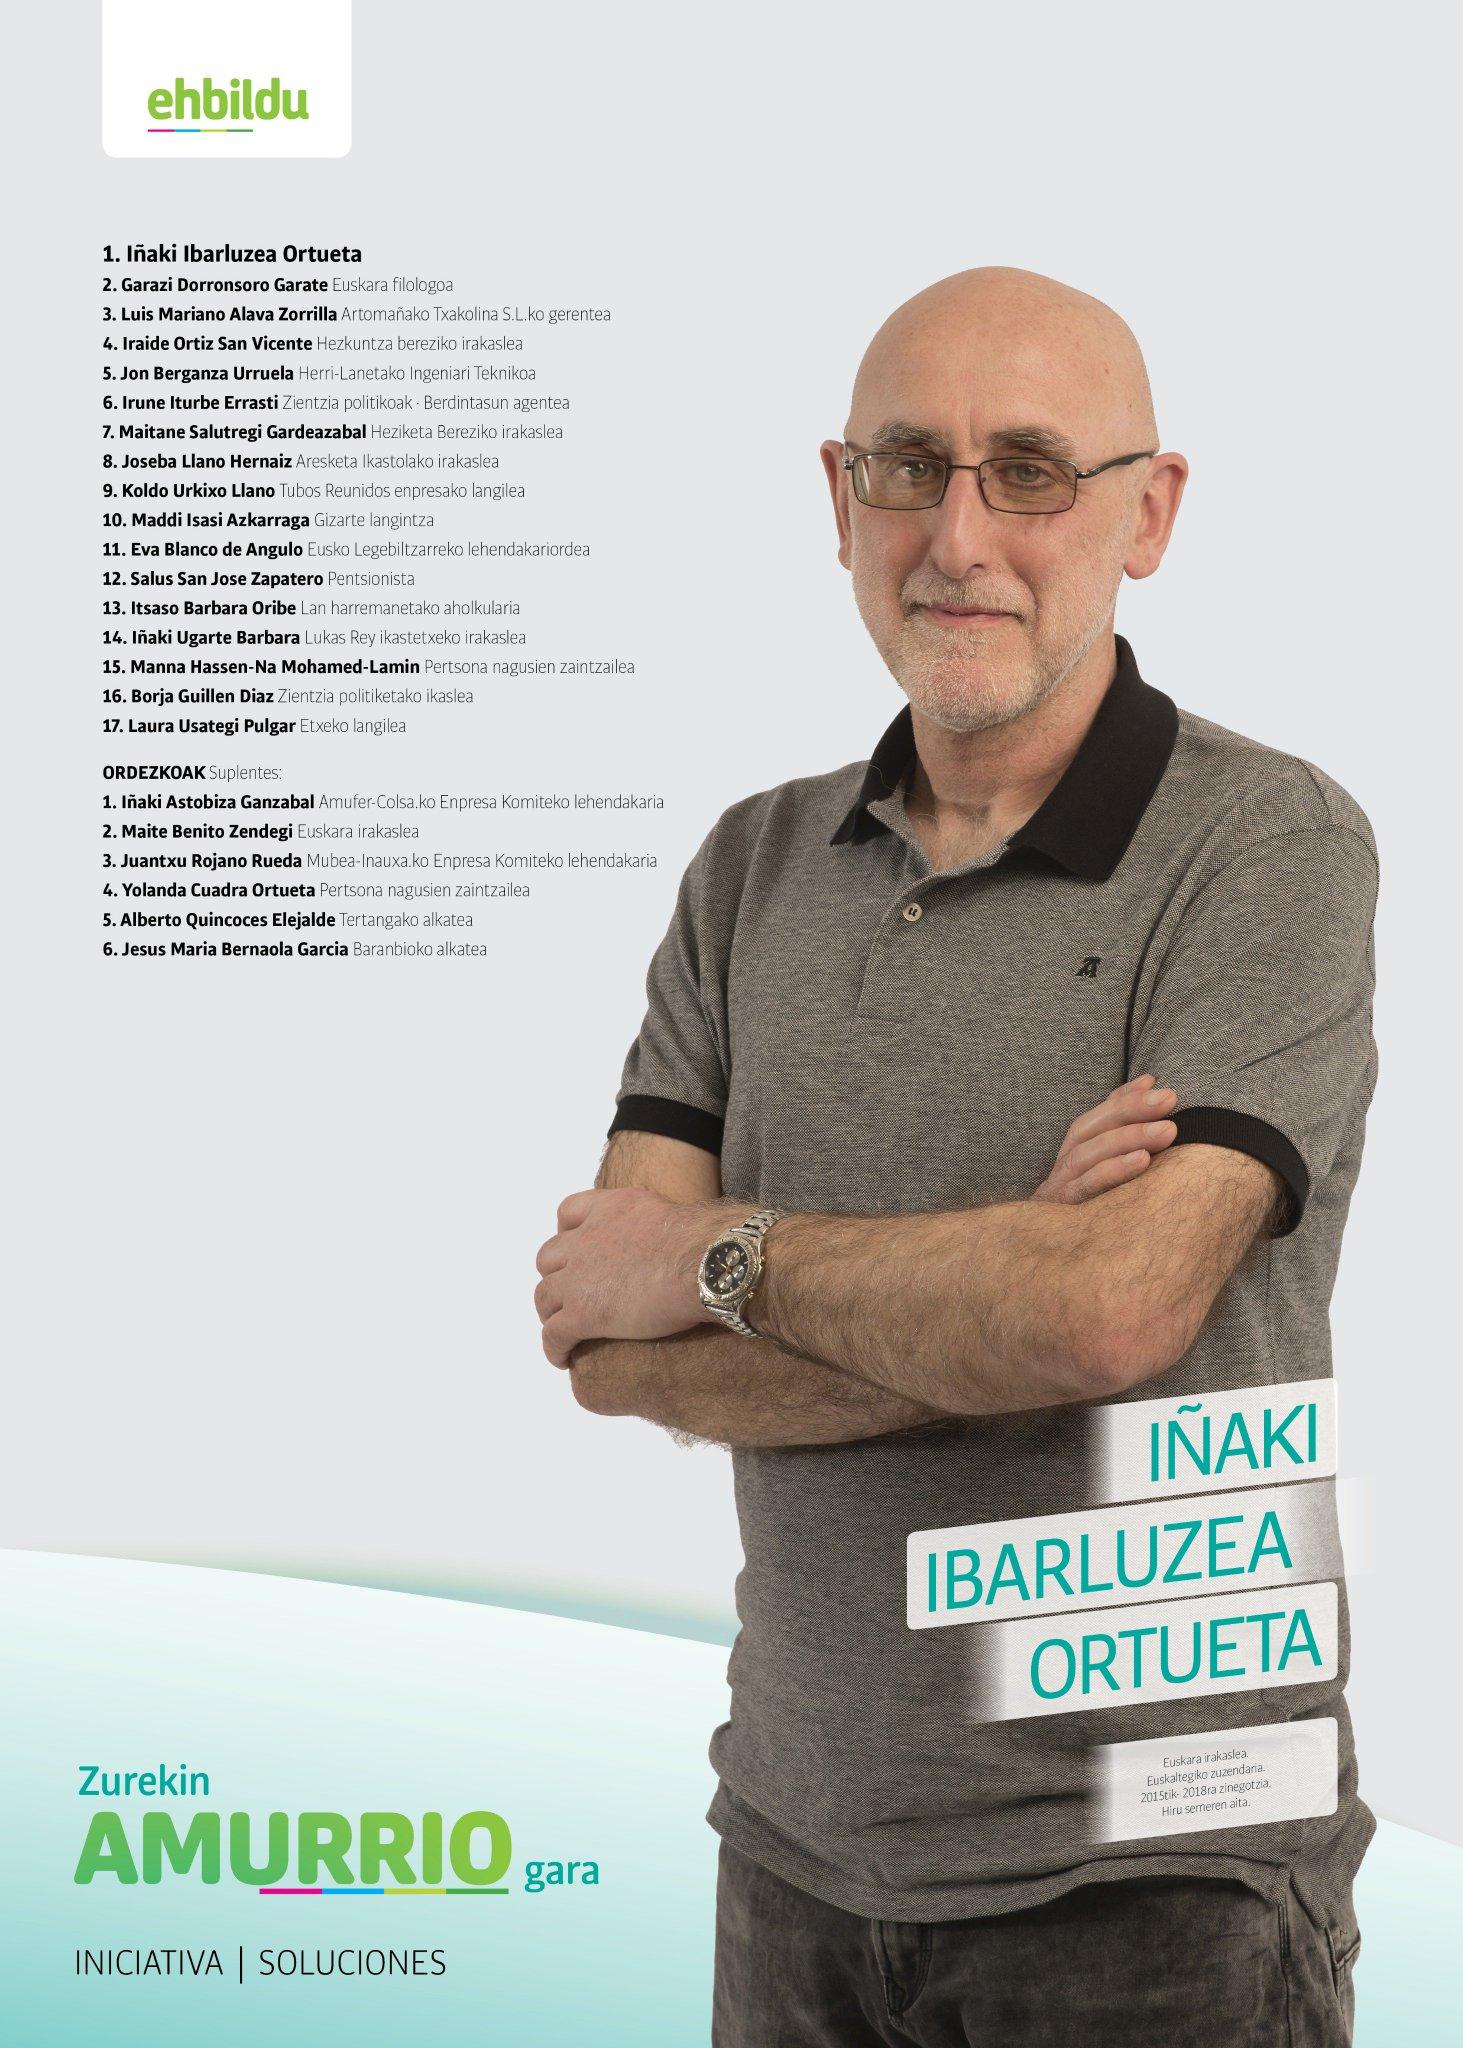 pelota vasca - LA PELOTA VASCA - Página 14 D4YUrylW0AAIn9K?format=jpg&name=large